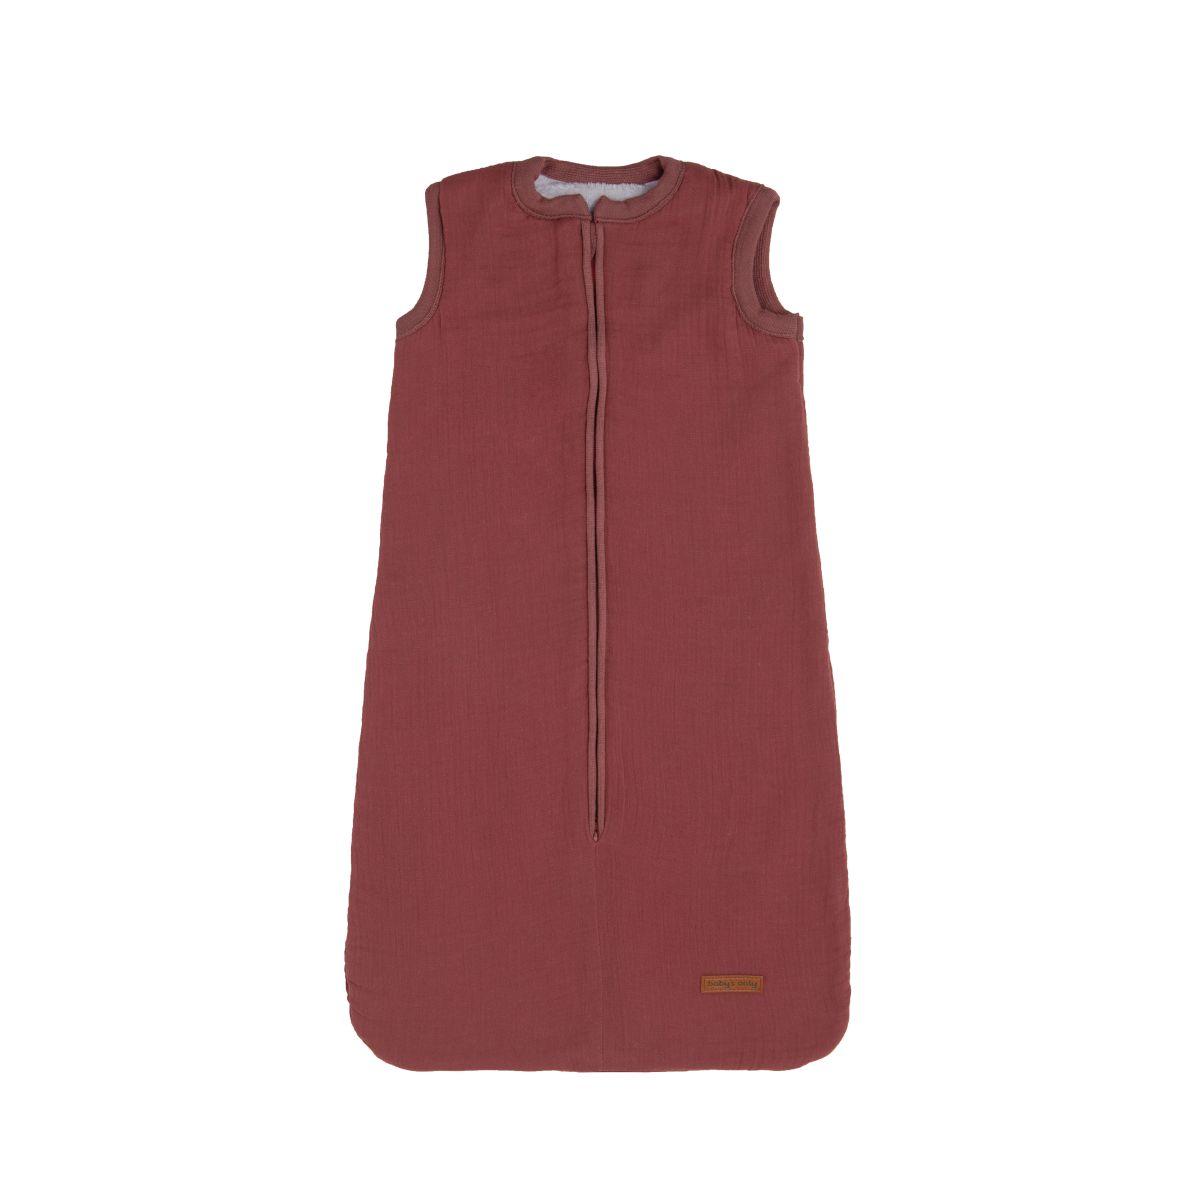 sleeping bag teddy breeze stone red 70 cm